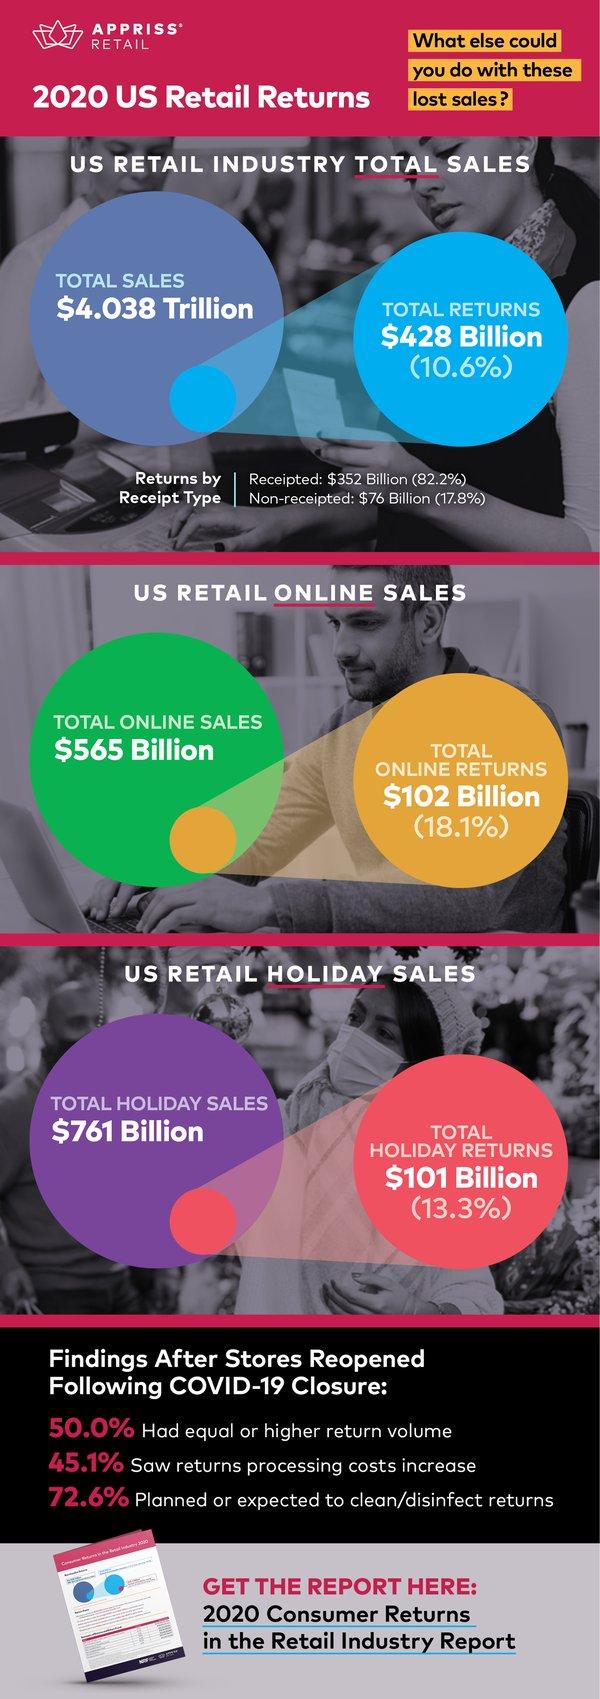 Retail-Returns-Infographic